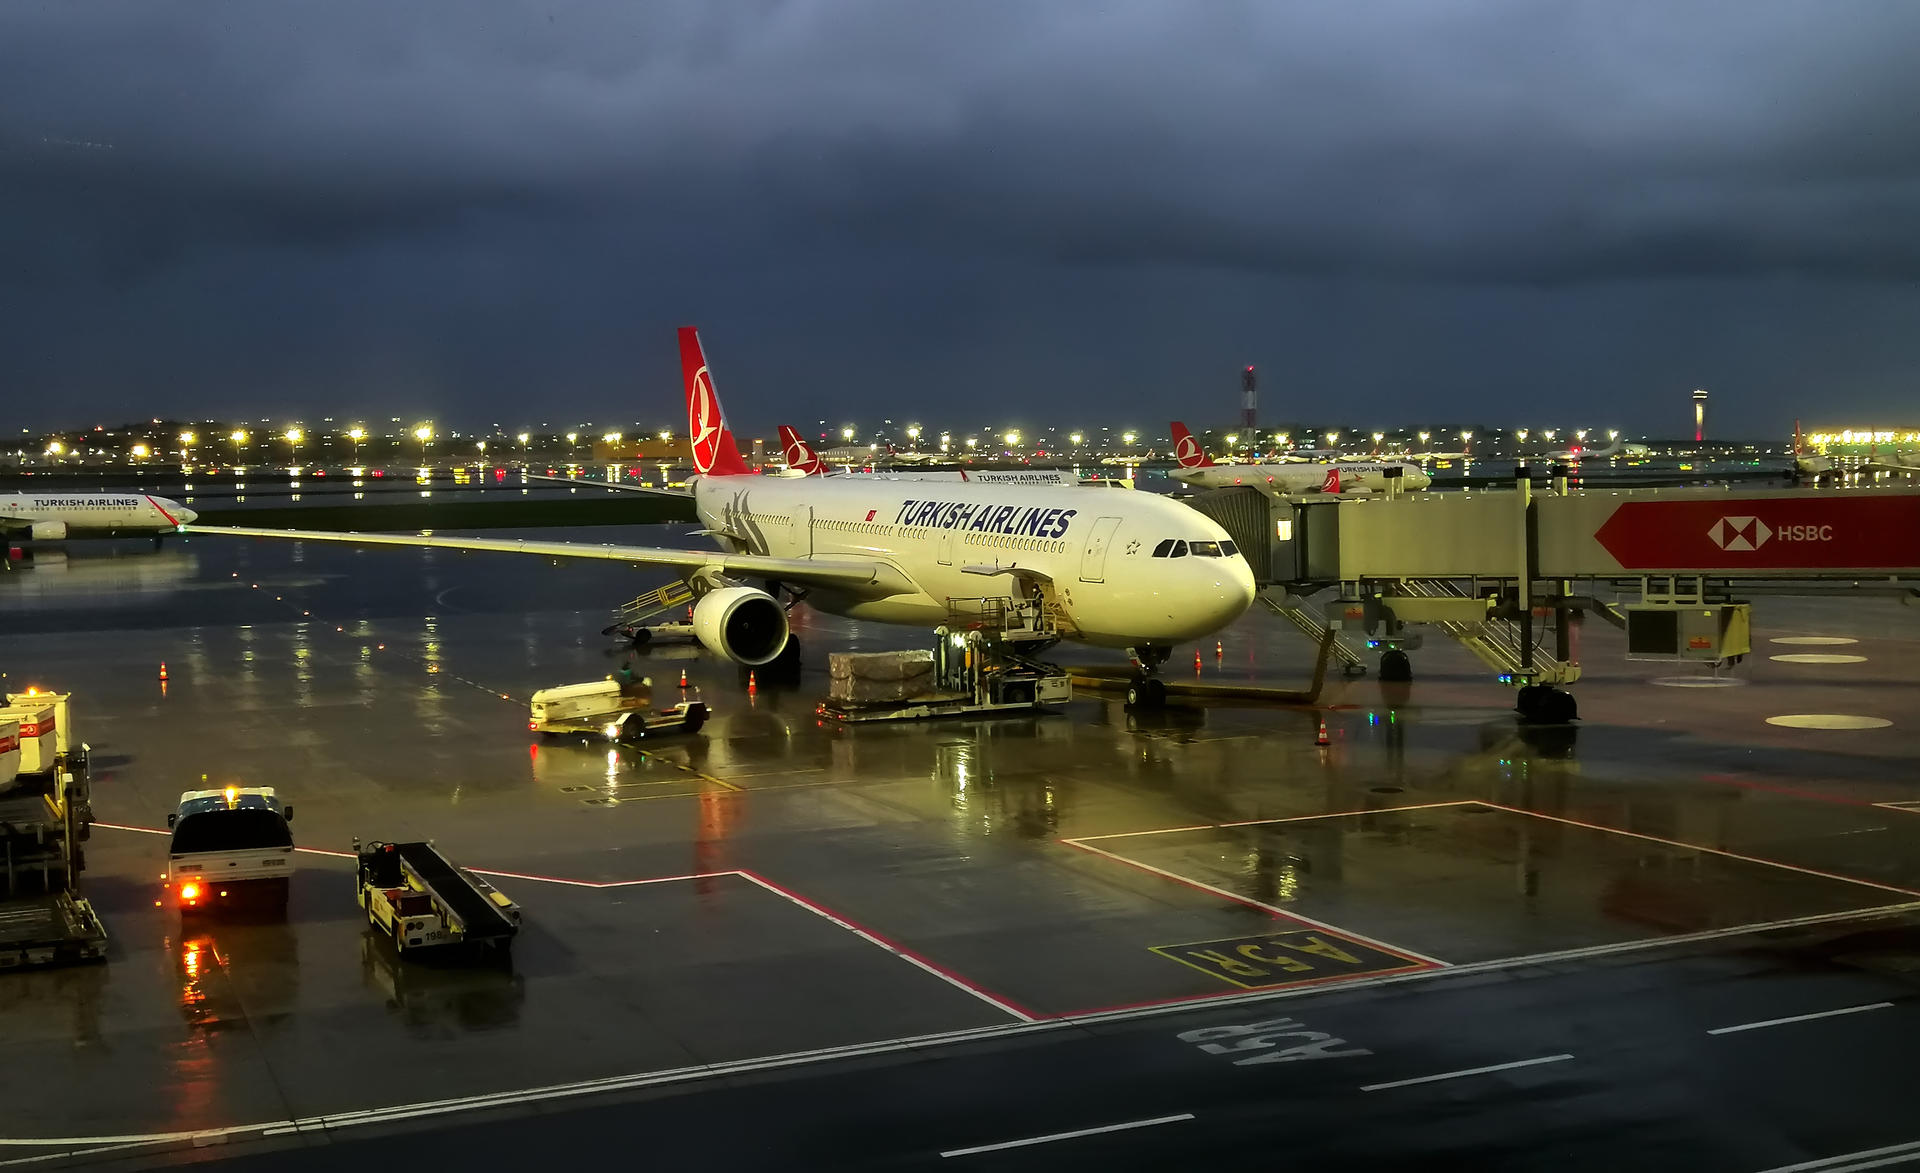 turkish_airlines_tc_lnd_airbus_a330_300_